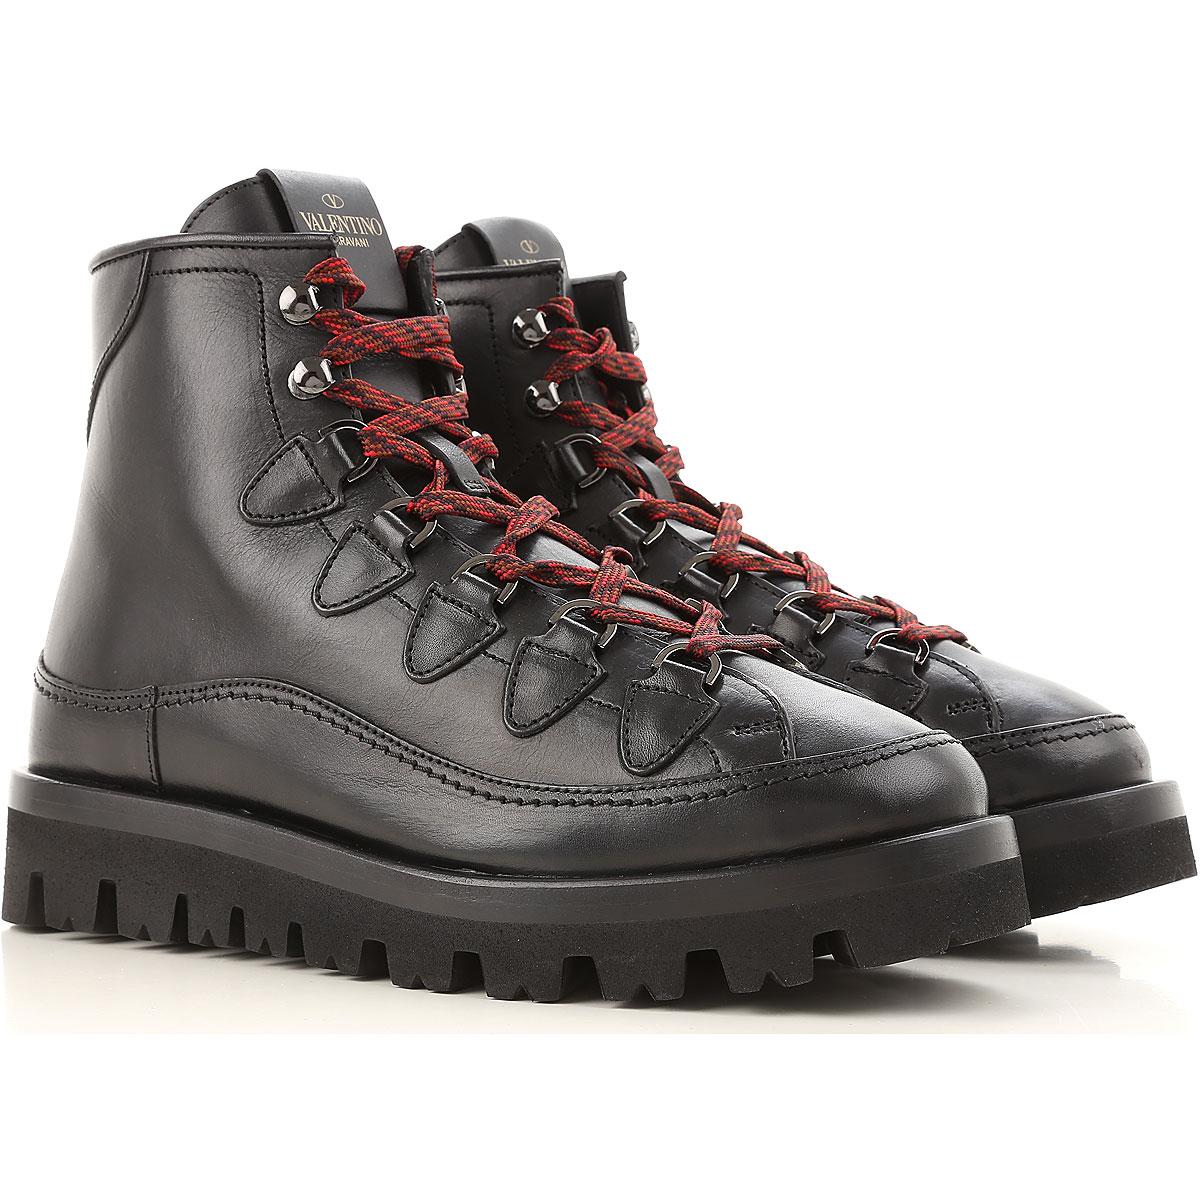 Mens Shoes Valentino Garavani. Style code: ny2s0a04-vac-0n0